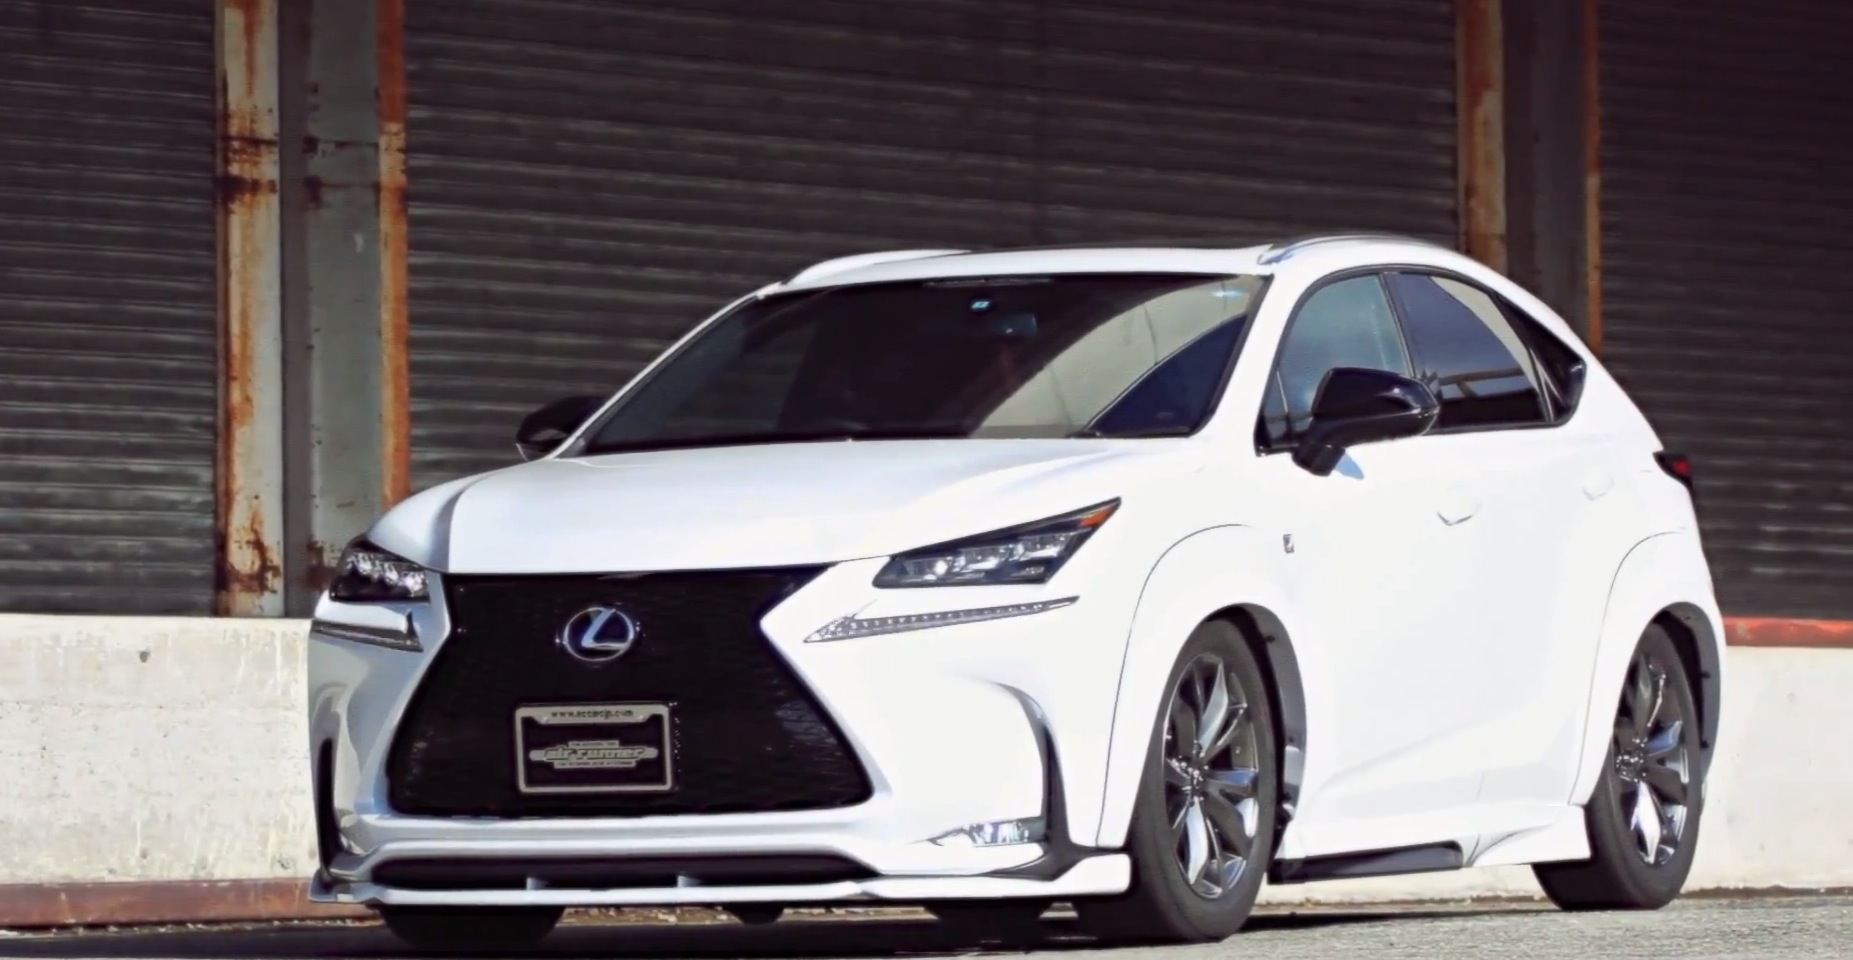 Lexus NX SUV Gets ACC Air Suspension and Widebody Kit